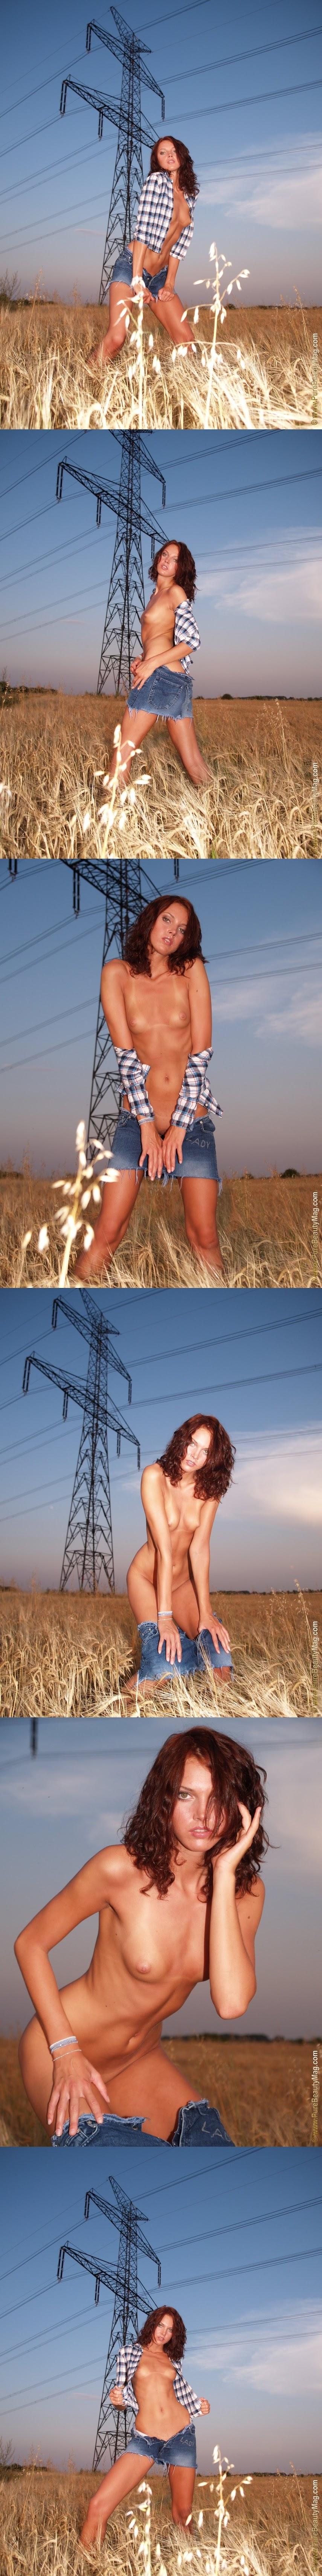 PureBeautyMag PBM  - 2005-07-30 -  s101917 - Jitka Branich - Electra - 2560px sexy girls image jav